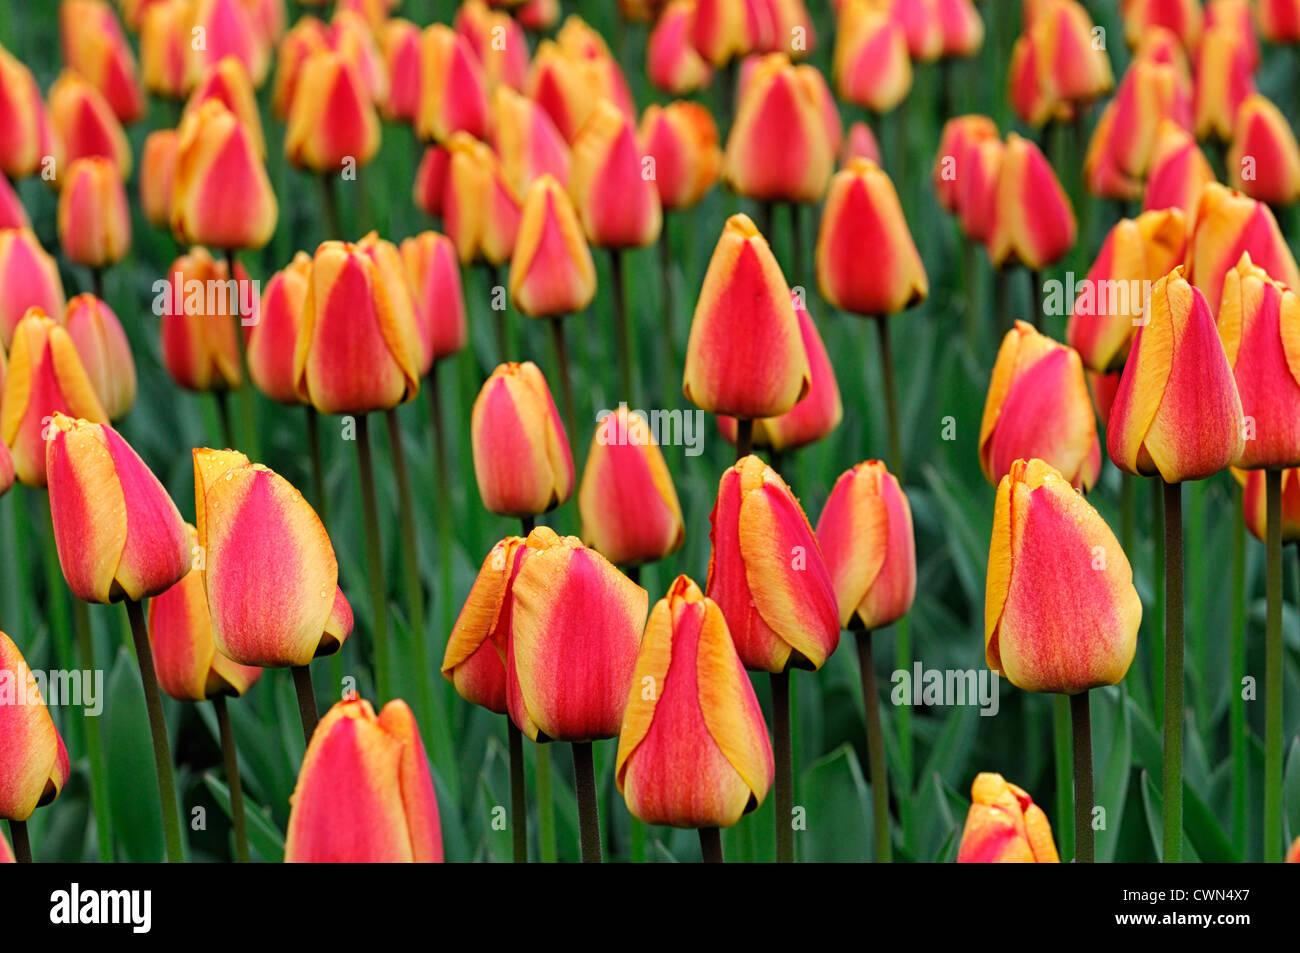 tulipa apeldoorns elite tulip darwin hybrid yellow orange garden flowers spring flower bloom blossom bed colour - Stock Image